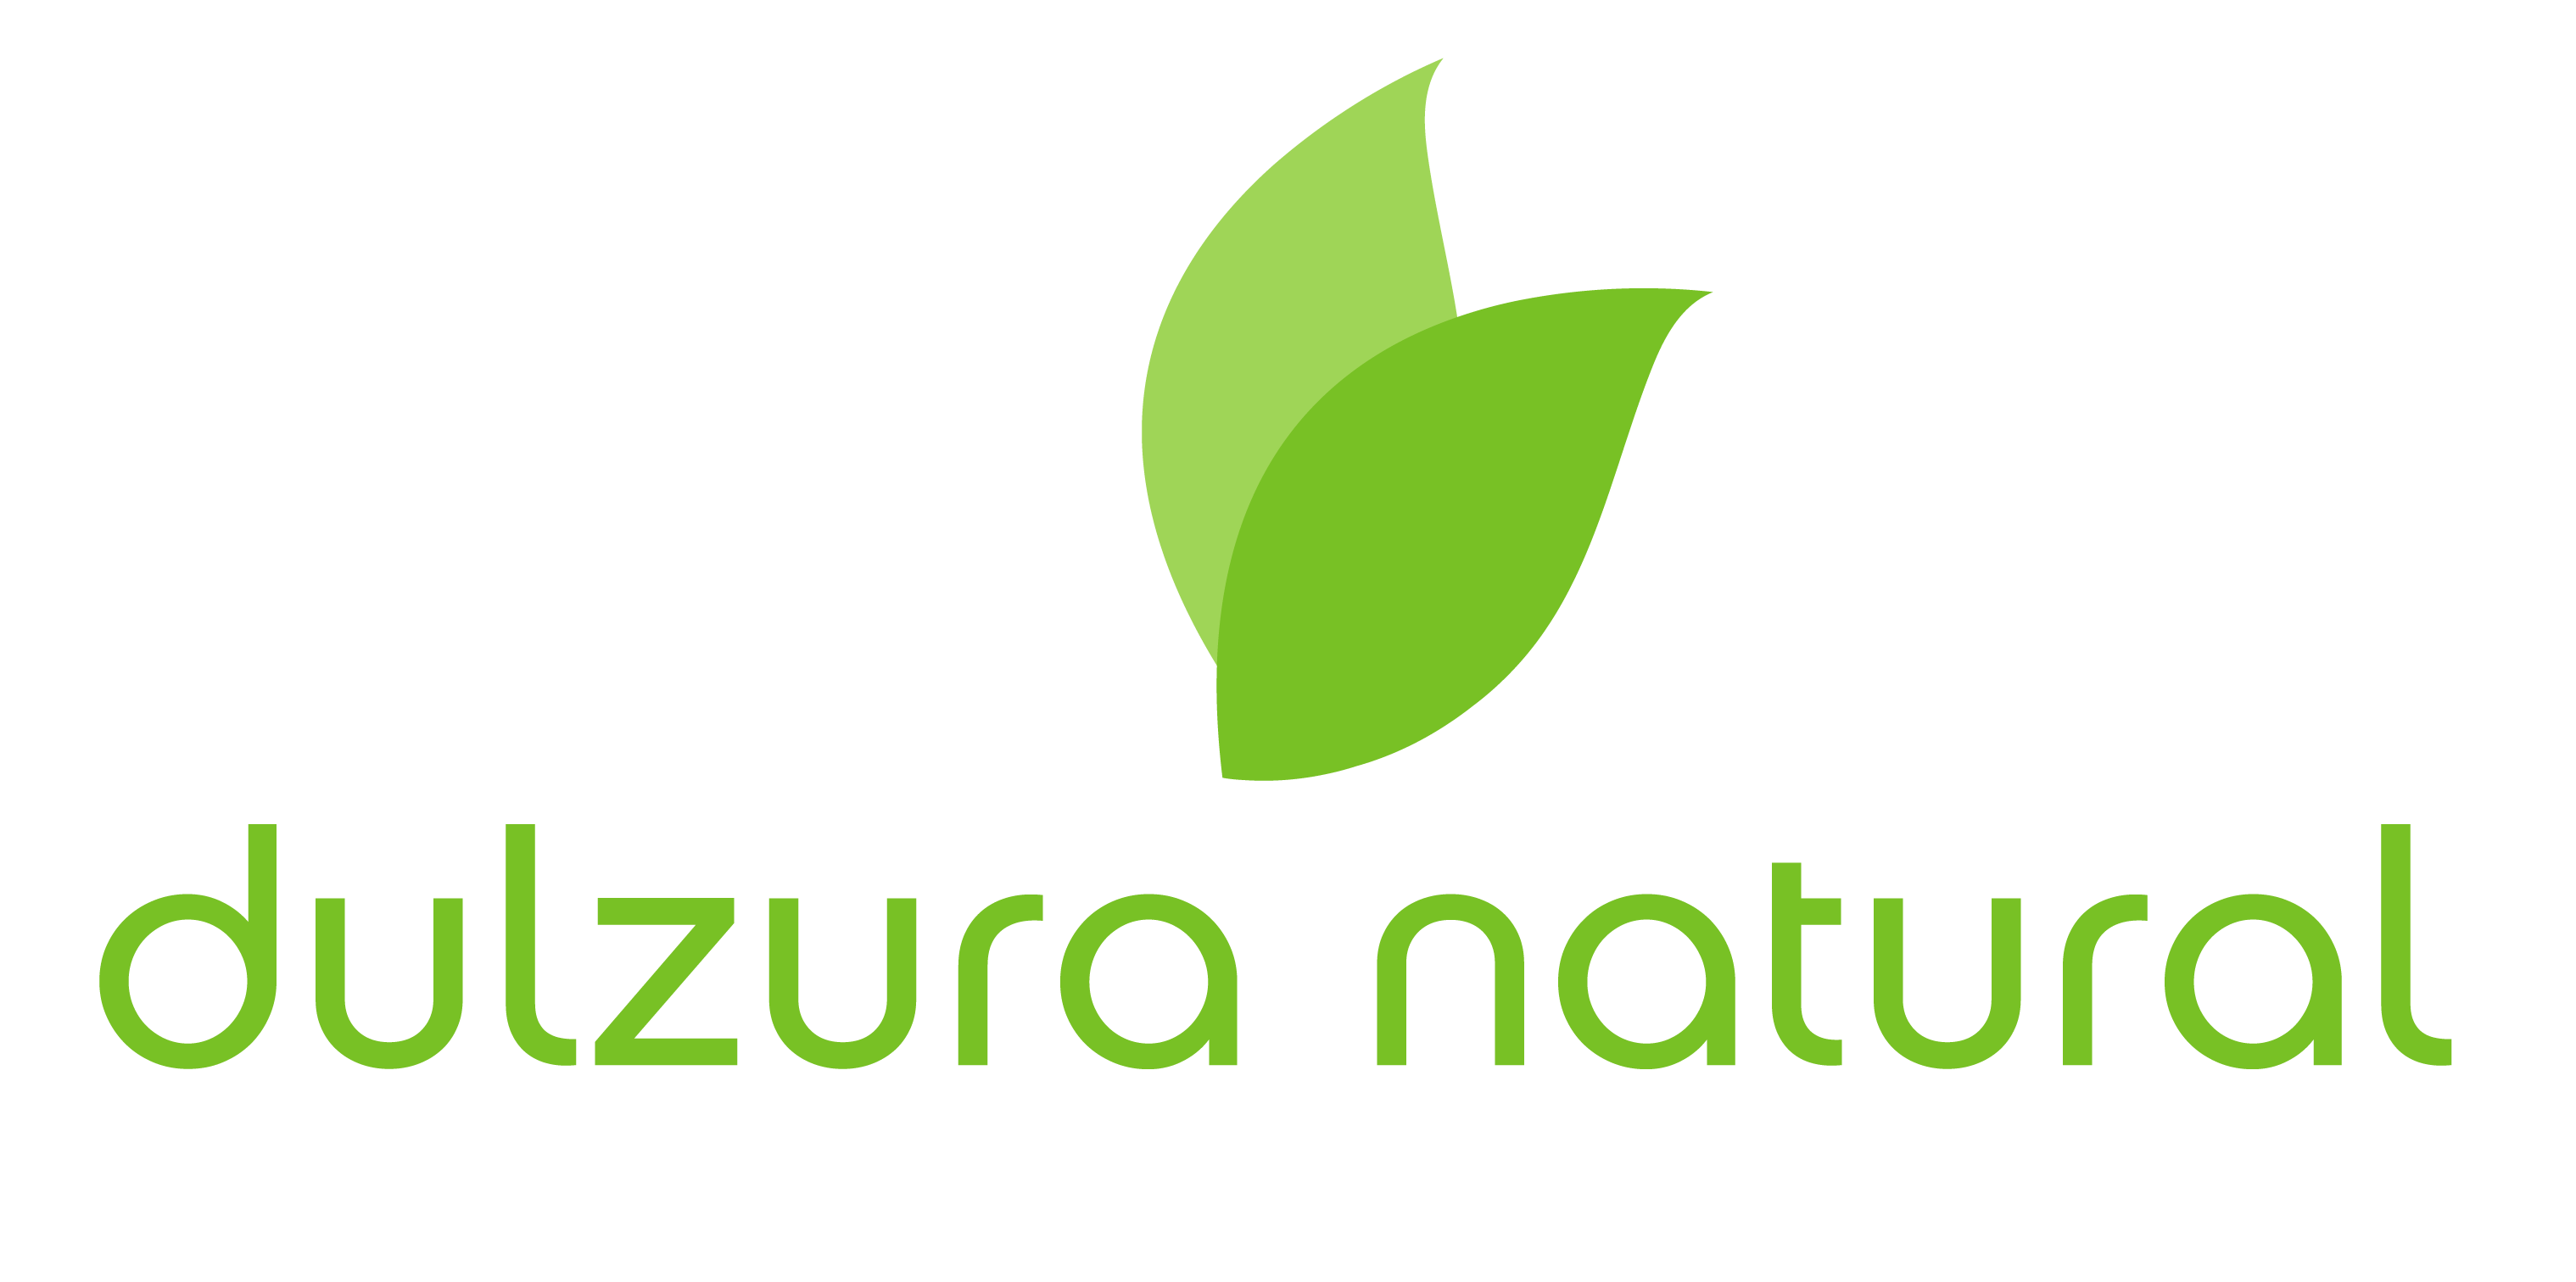 dulzura natural logotipo-01